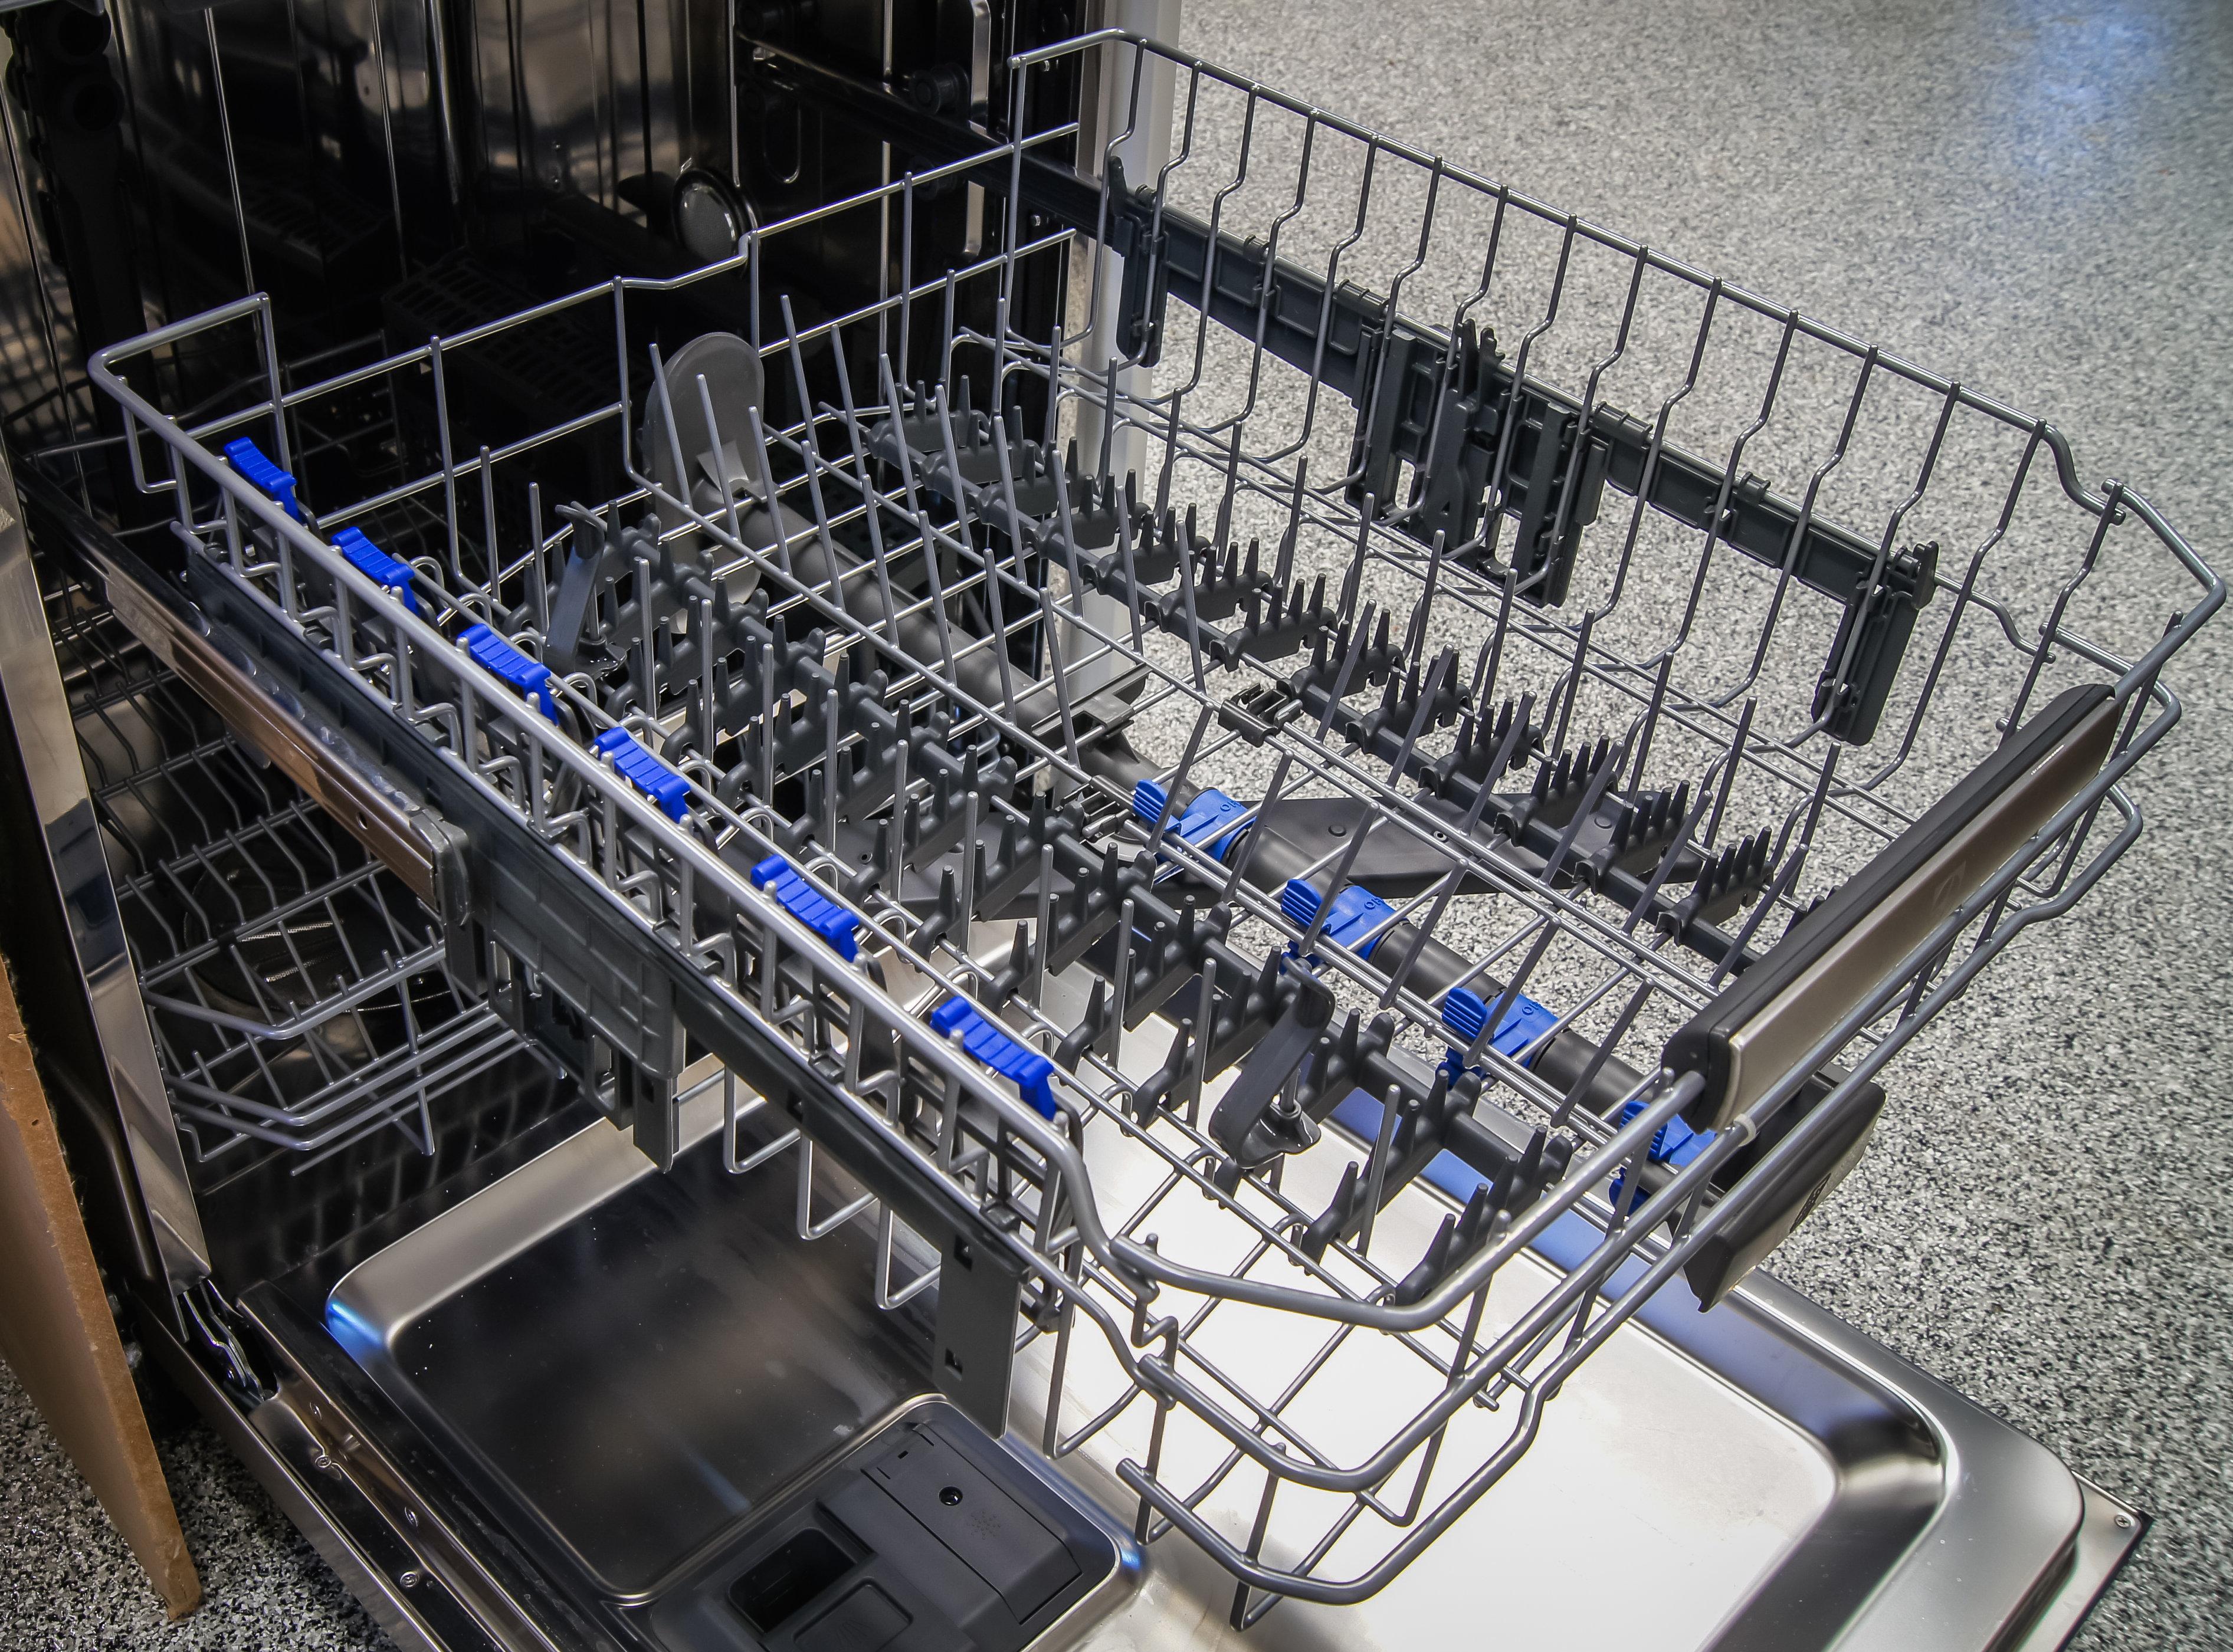 Electrolux EI24ID50QS top rack